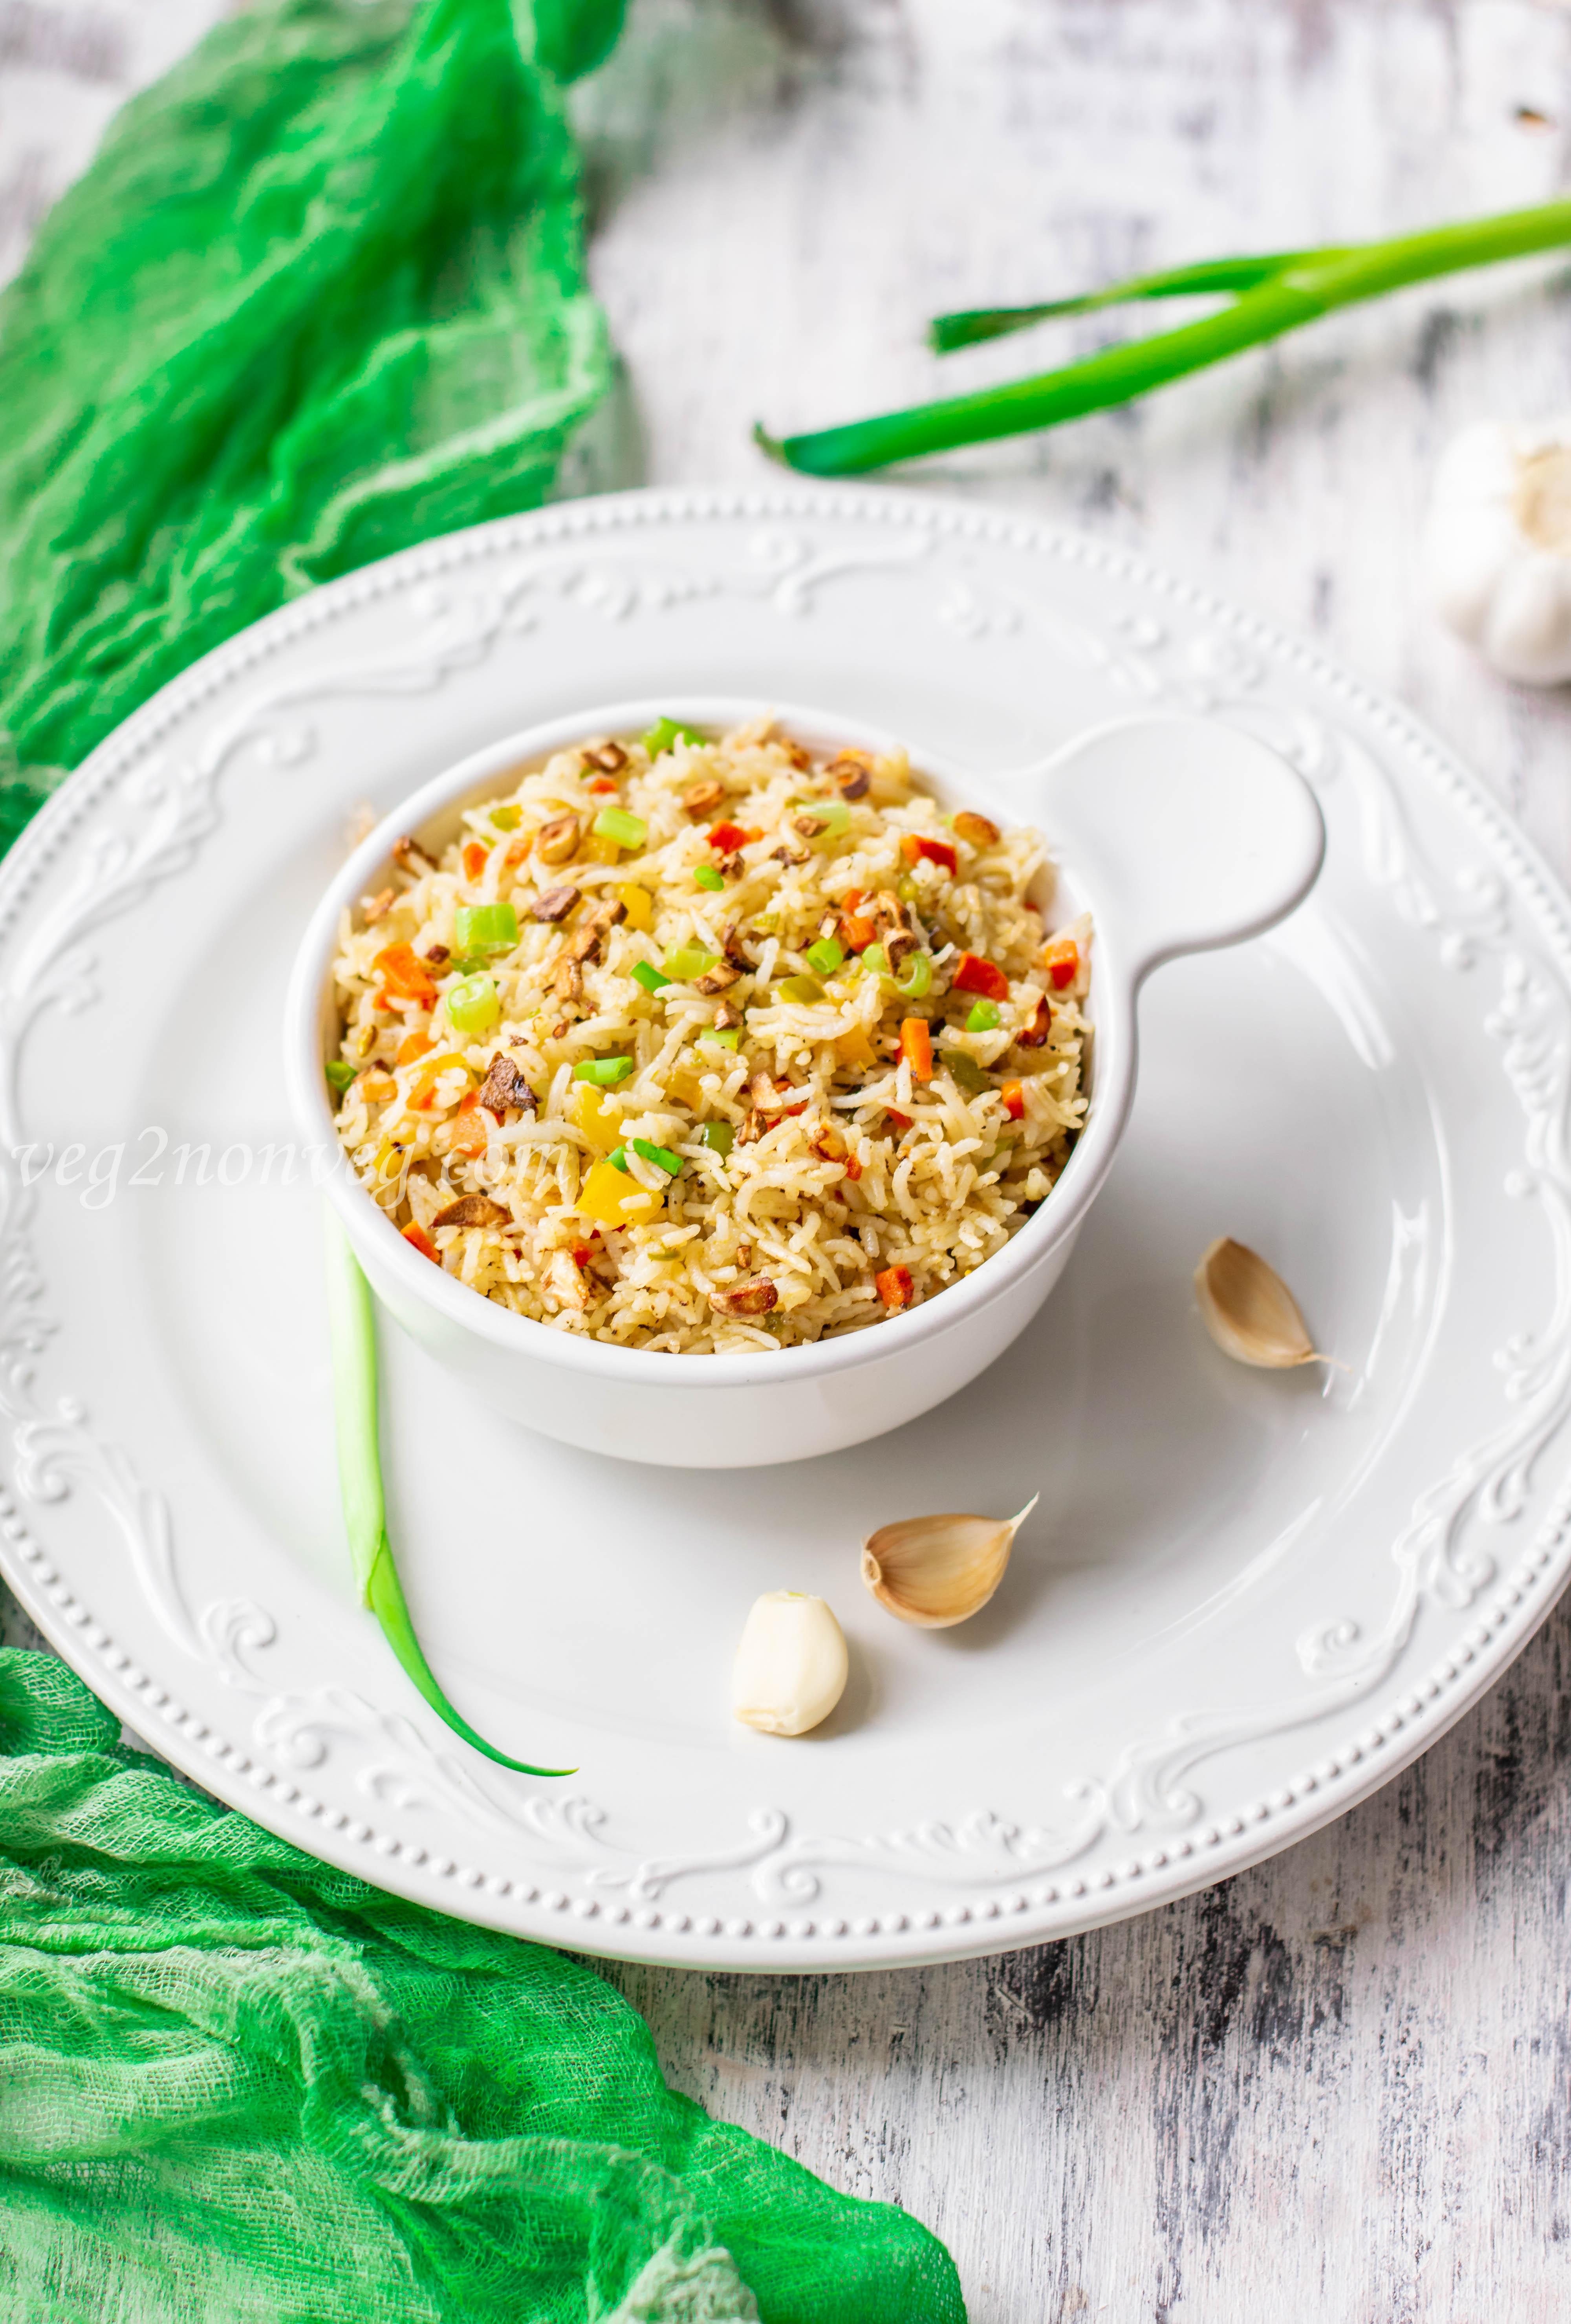 Burnt garlic vegetable fried rice